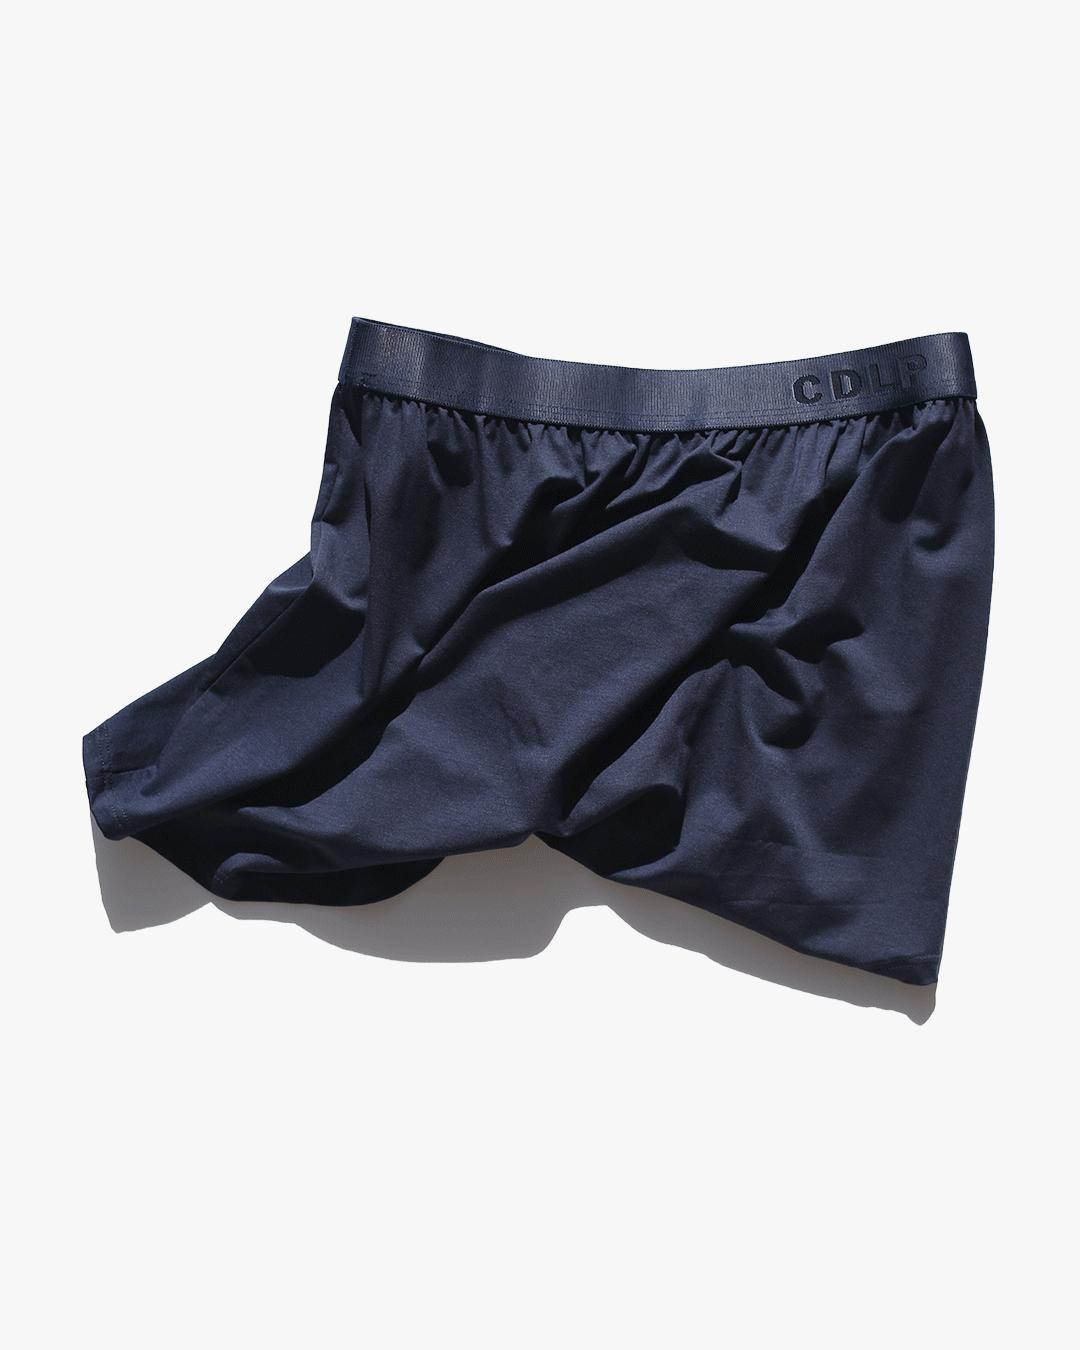 CDLP Boxer Shorts Navy Blue 3